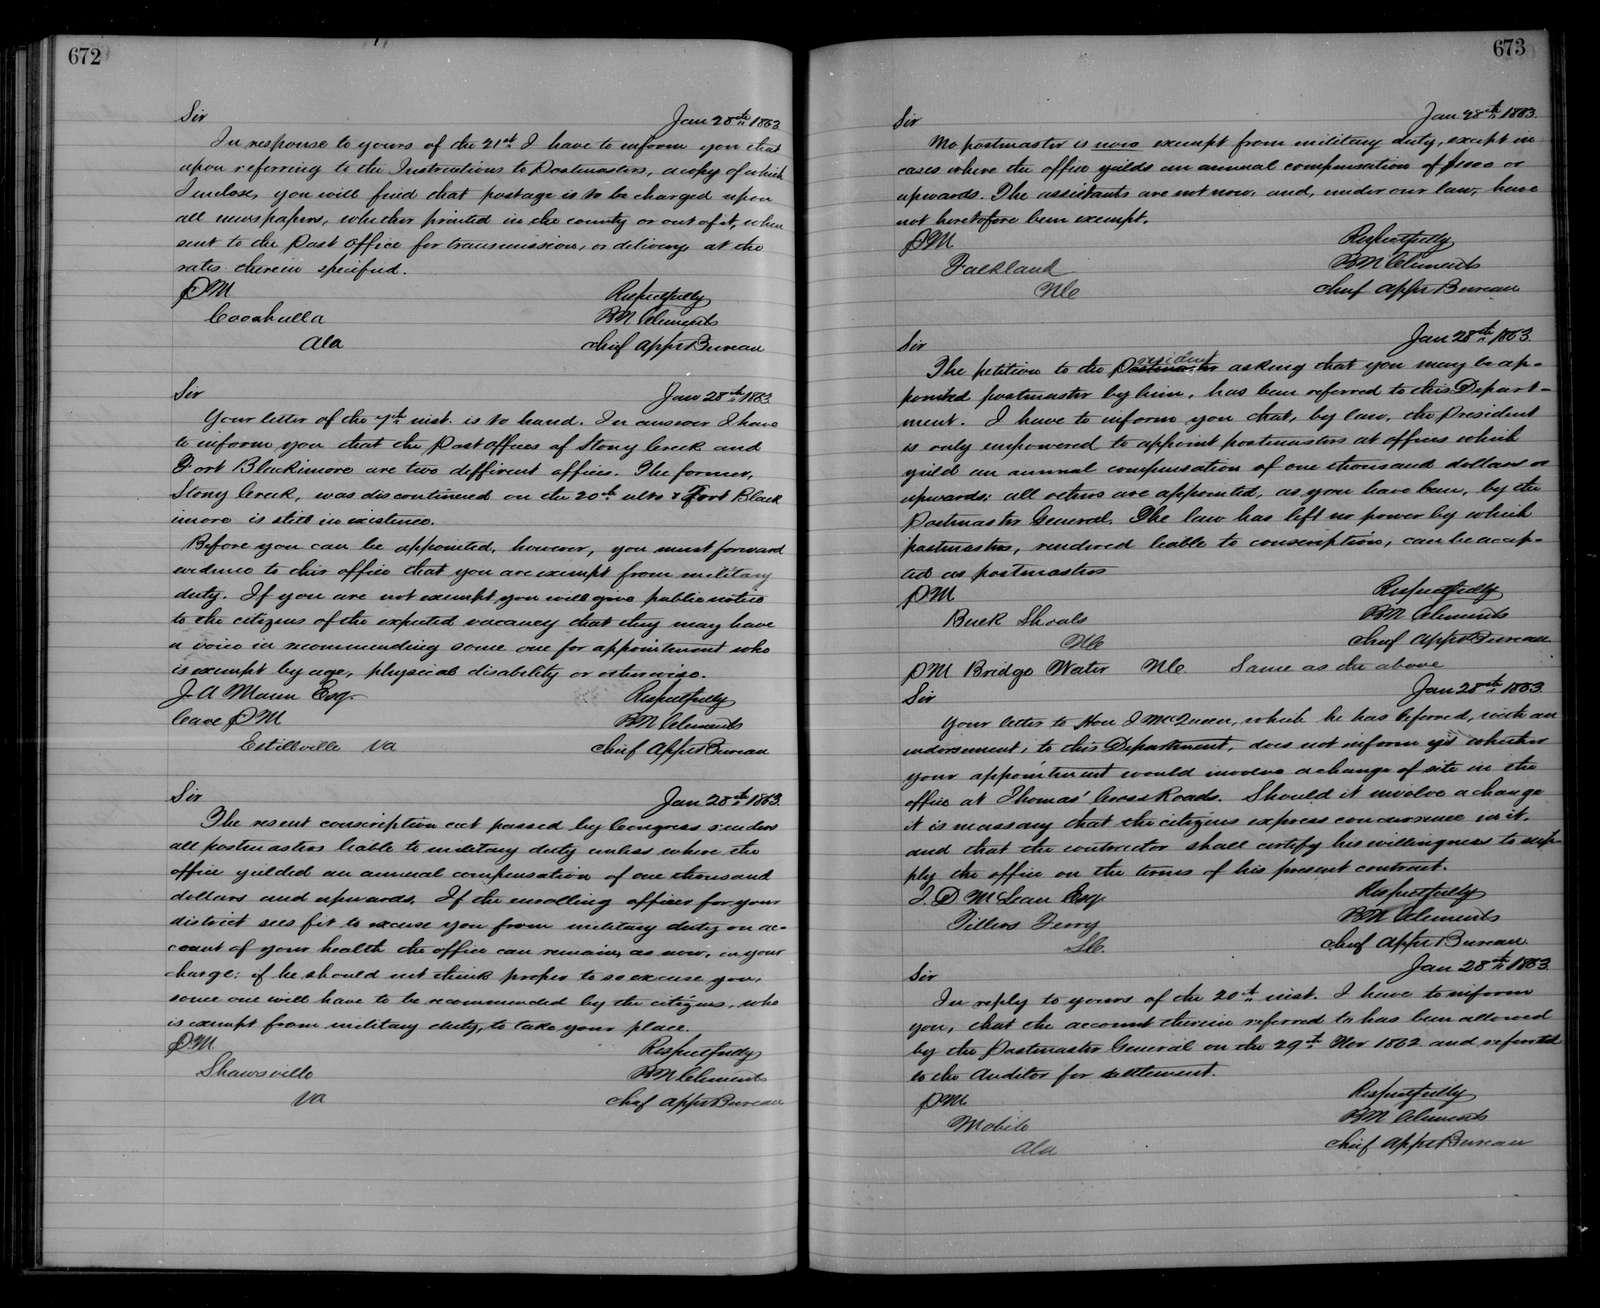 Confederate States of America records: Microfilm Reel 50